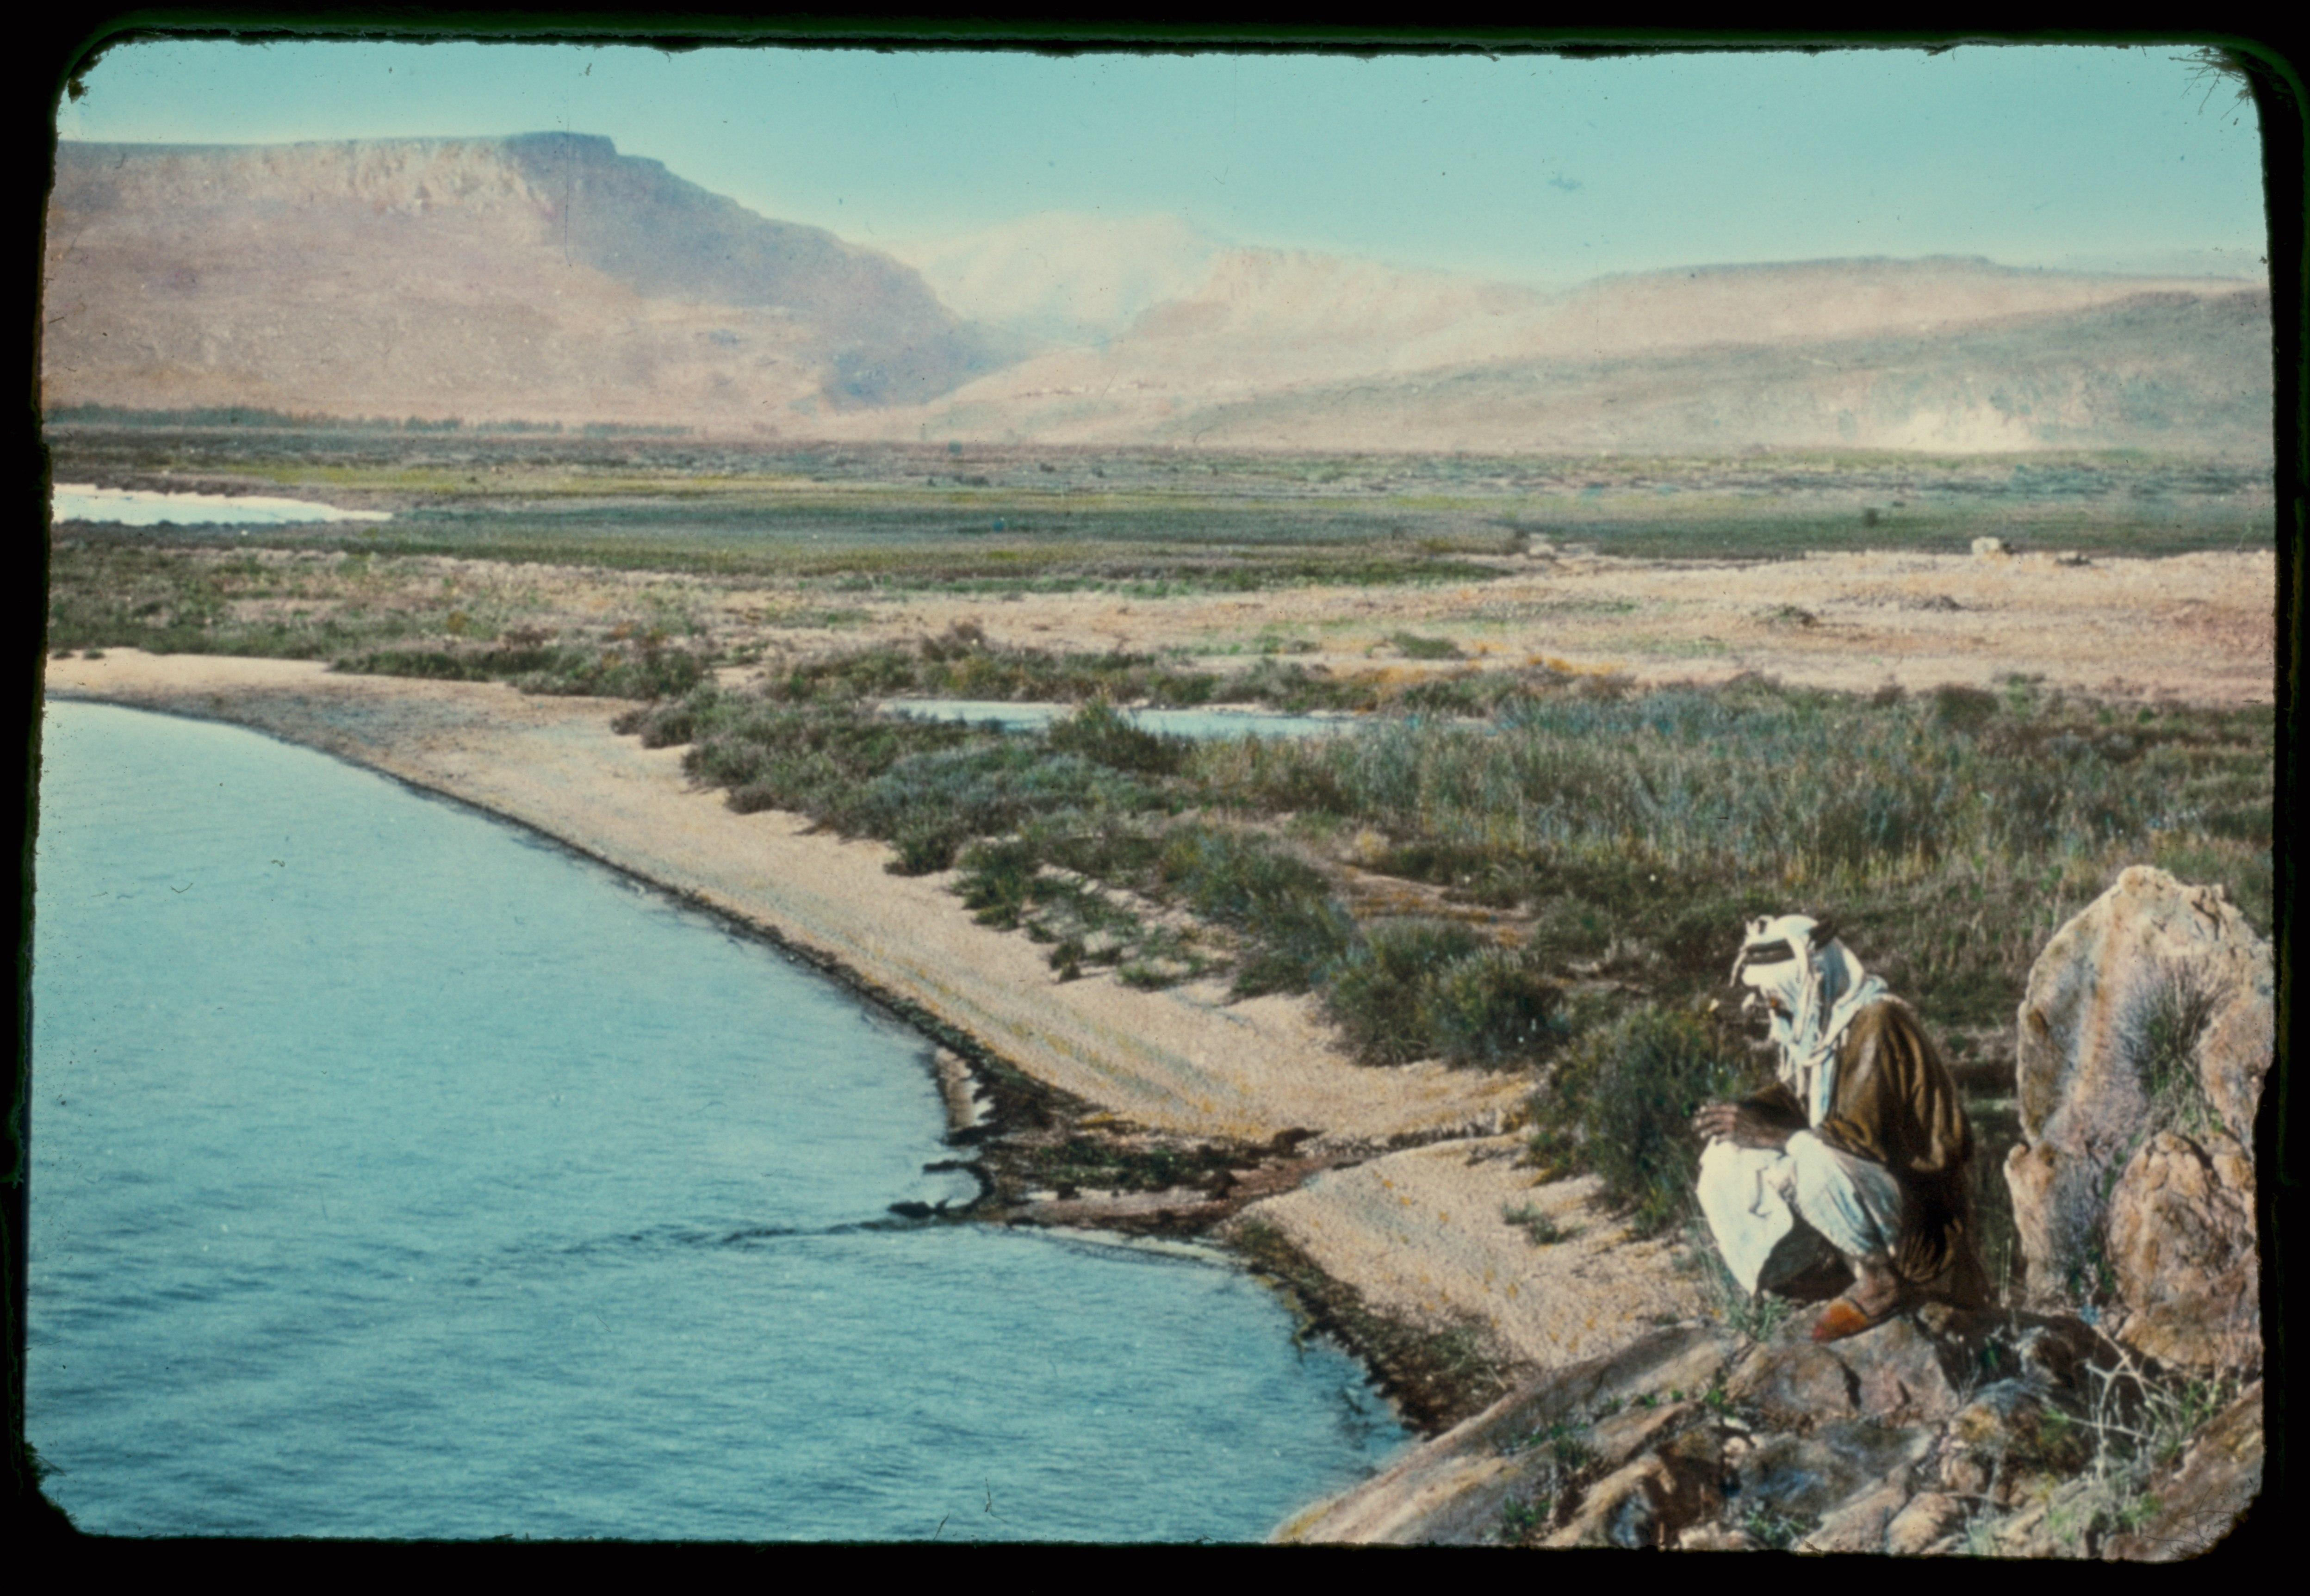 Around_the_Sea_of_Galilee._Plain_of_Gennesareth_and_the_Lake._Luke_5-1_LOC_matpc.22961